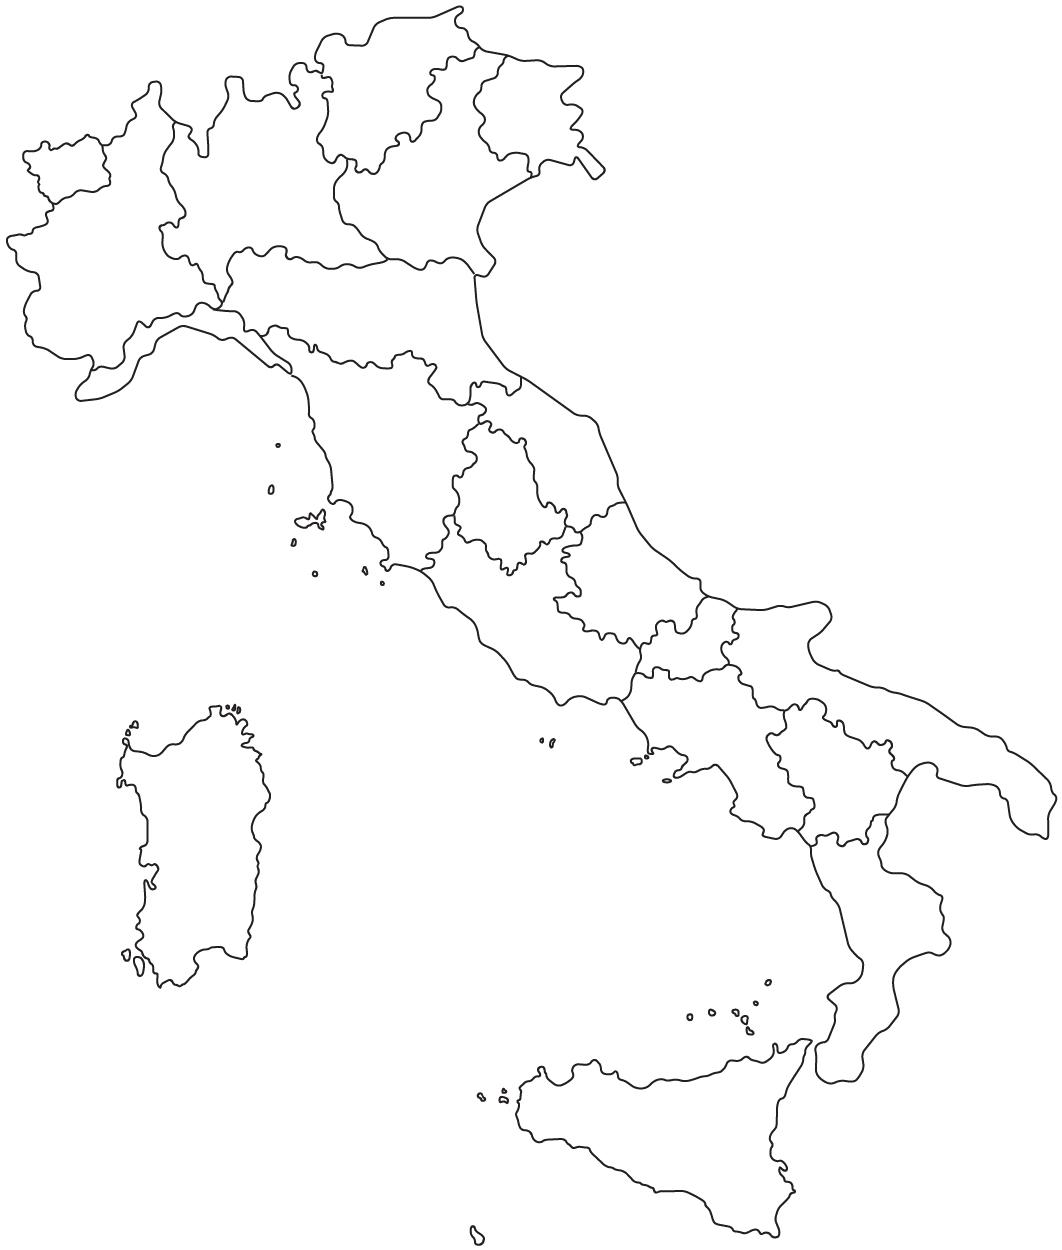 Vinotria-Italy-White-Virgin-Map